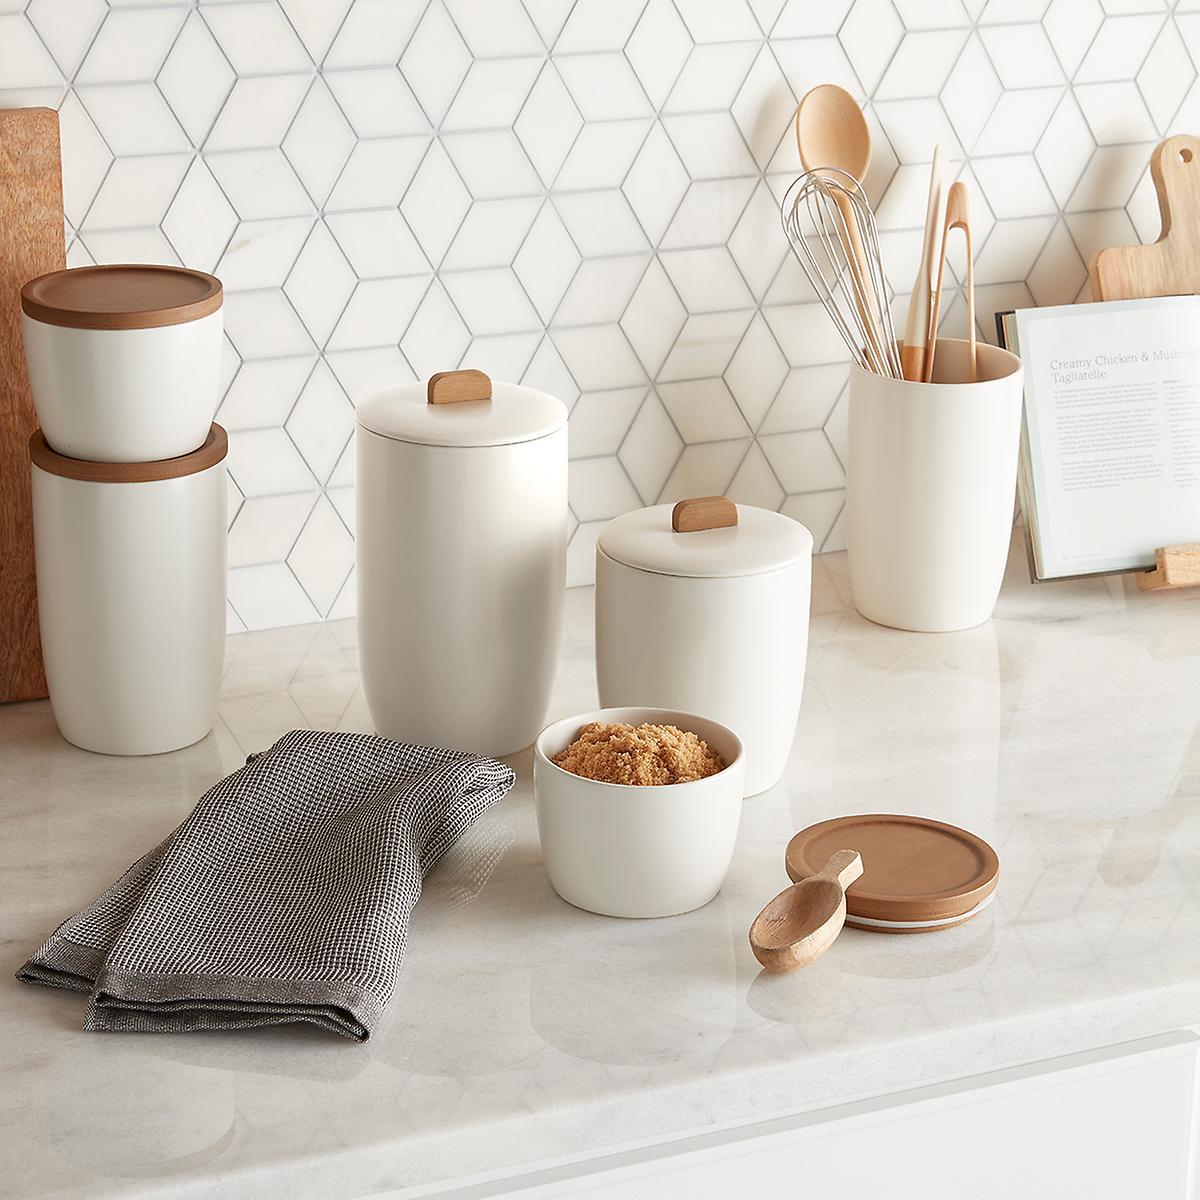 P9 20 Ceramic Kitchen Collection 100